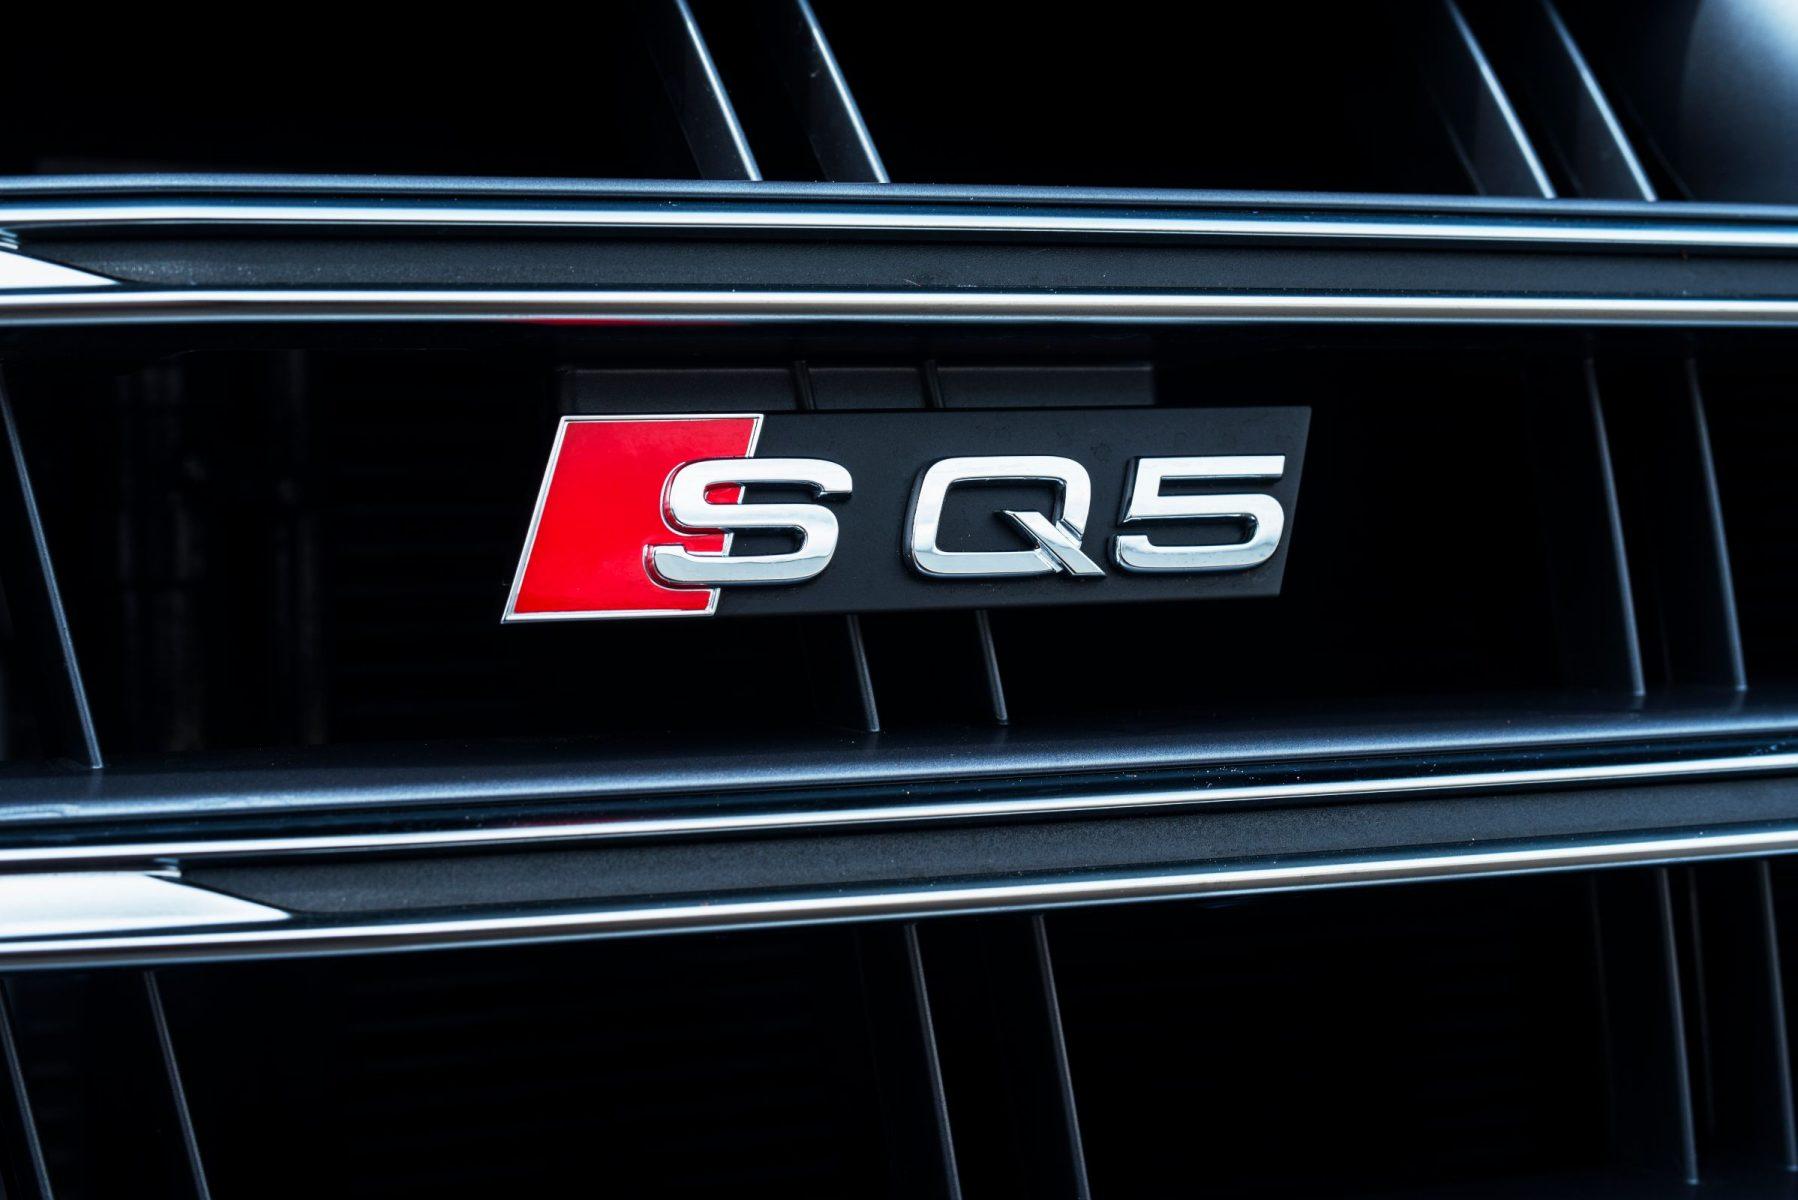 sq5 8